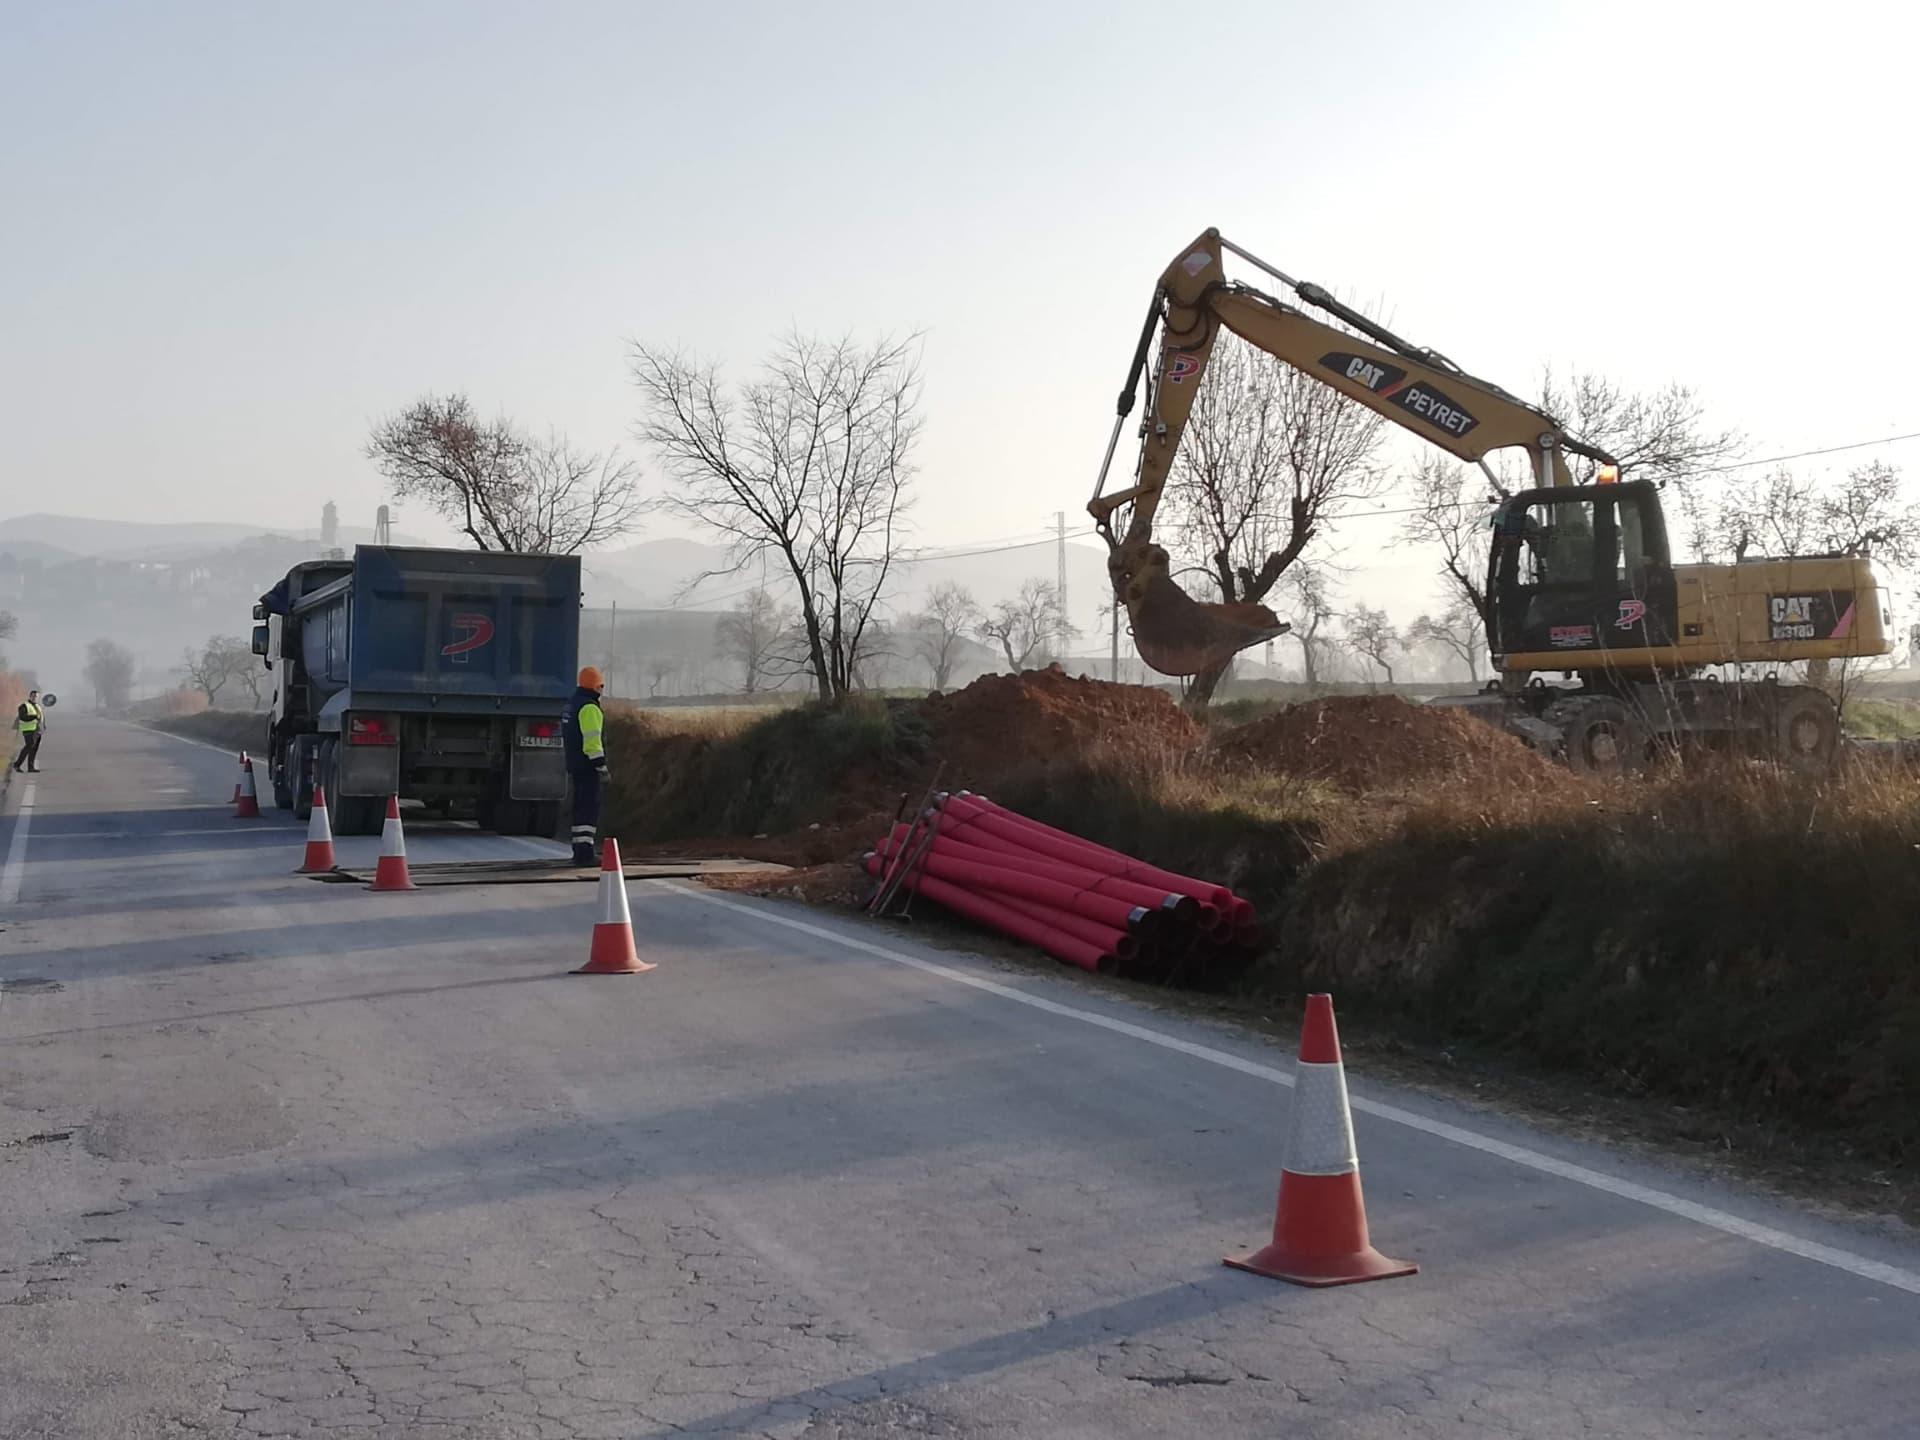 trabajo-especial-cruce-carretera-peyret